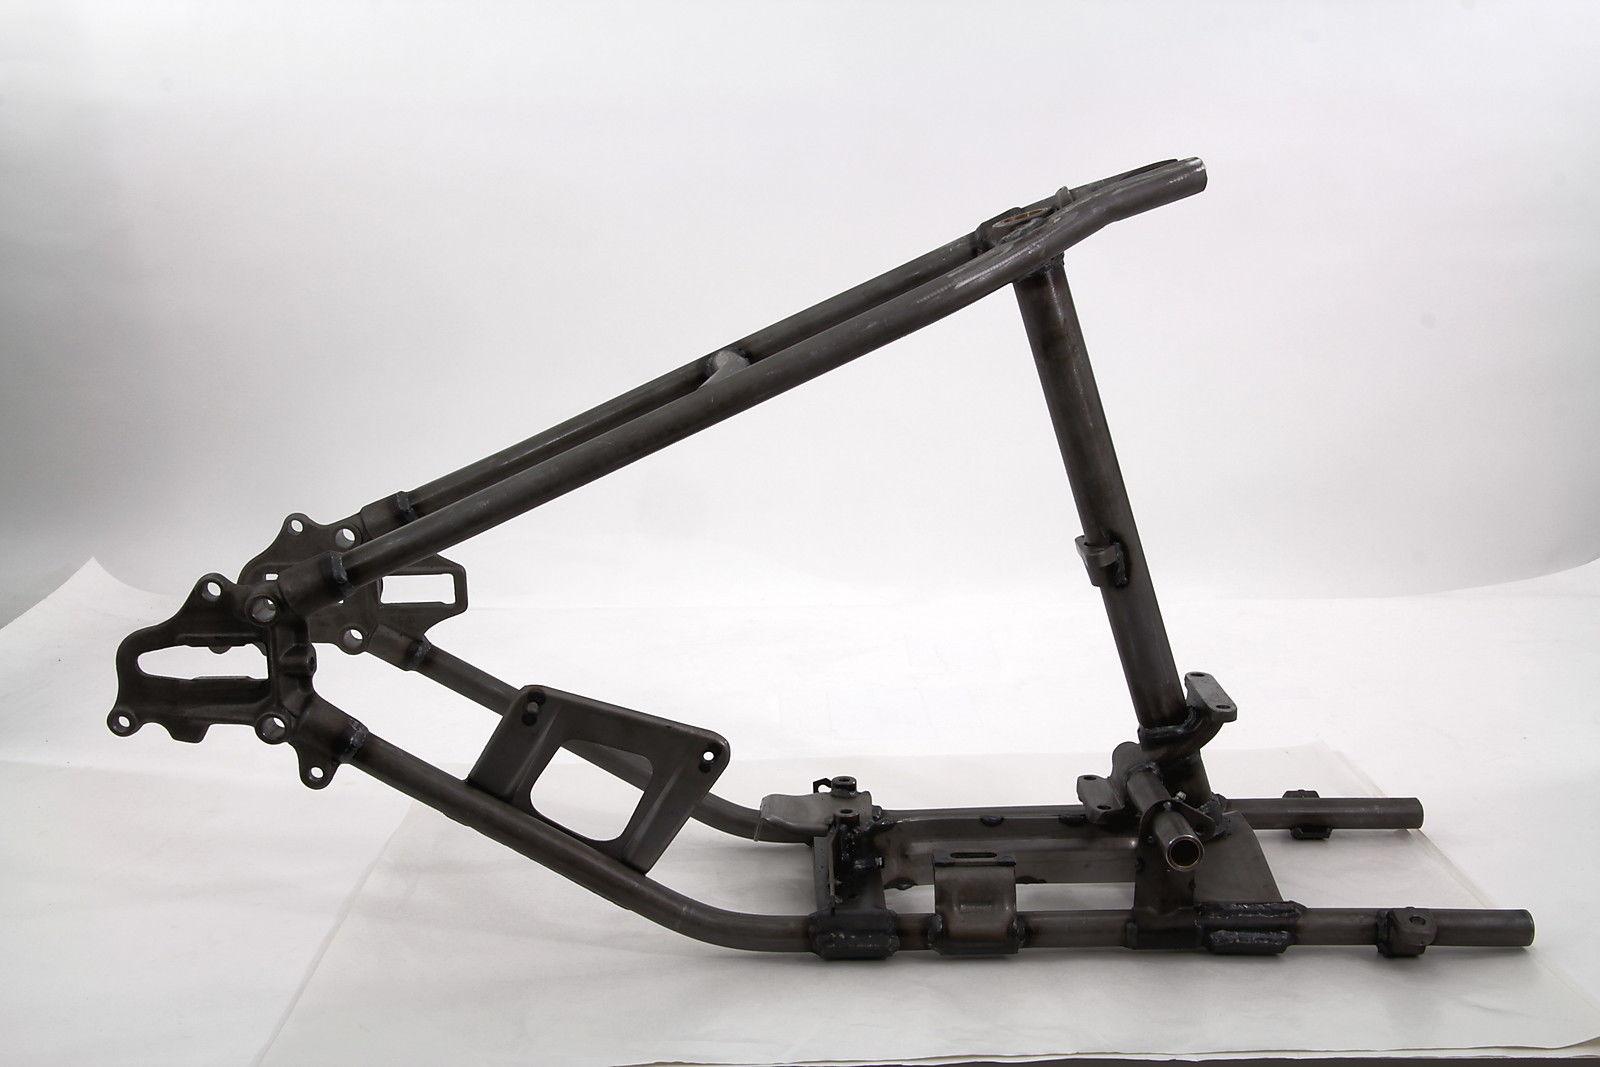 Replica panhead hardtails 4 shovelhead frames - The Jockey Journal Board